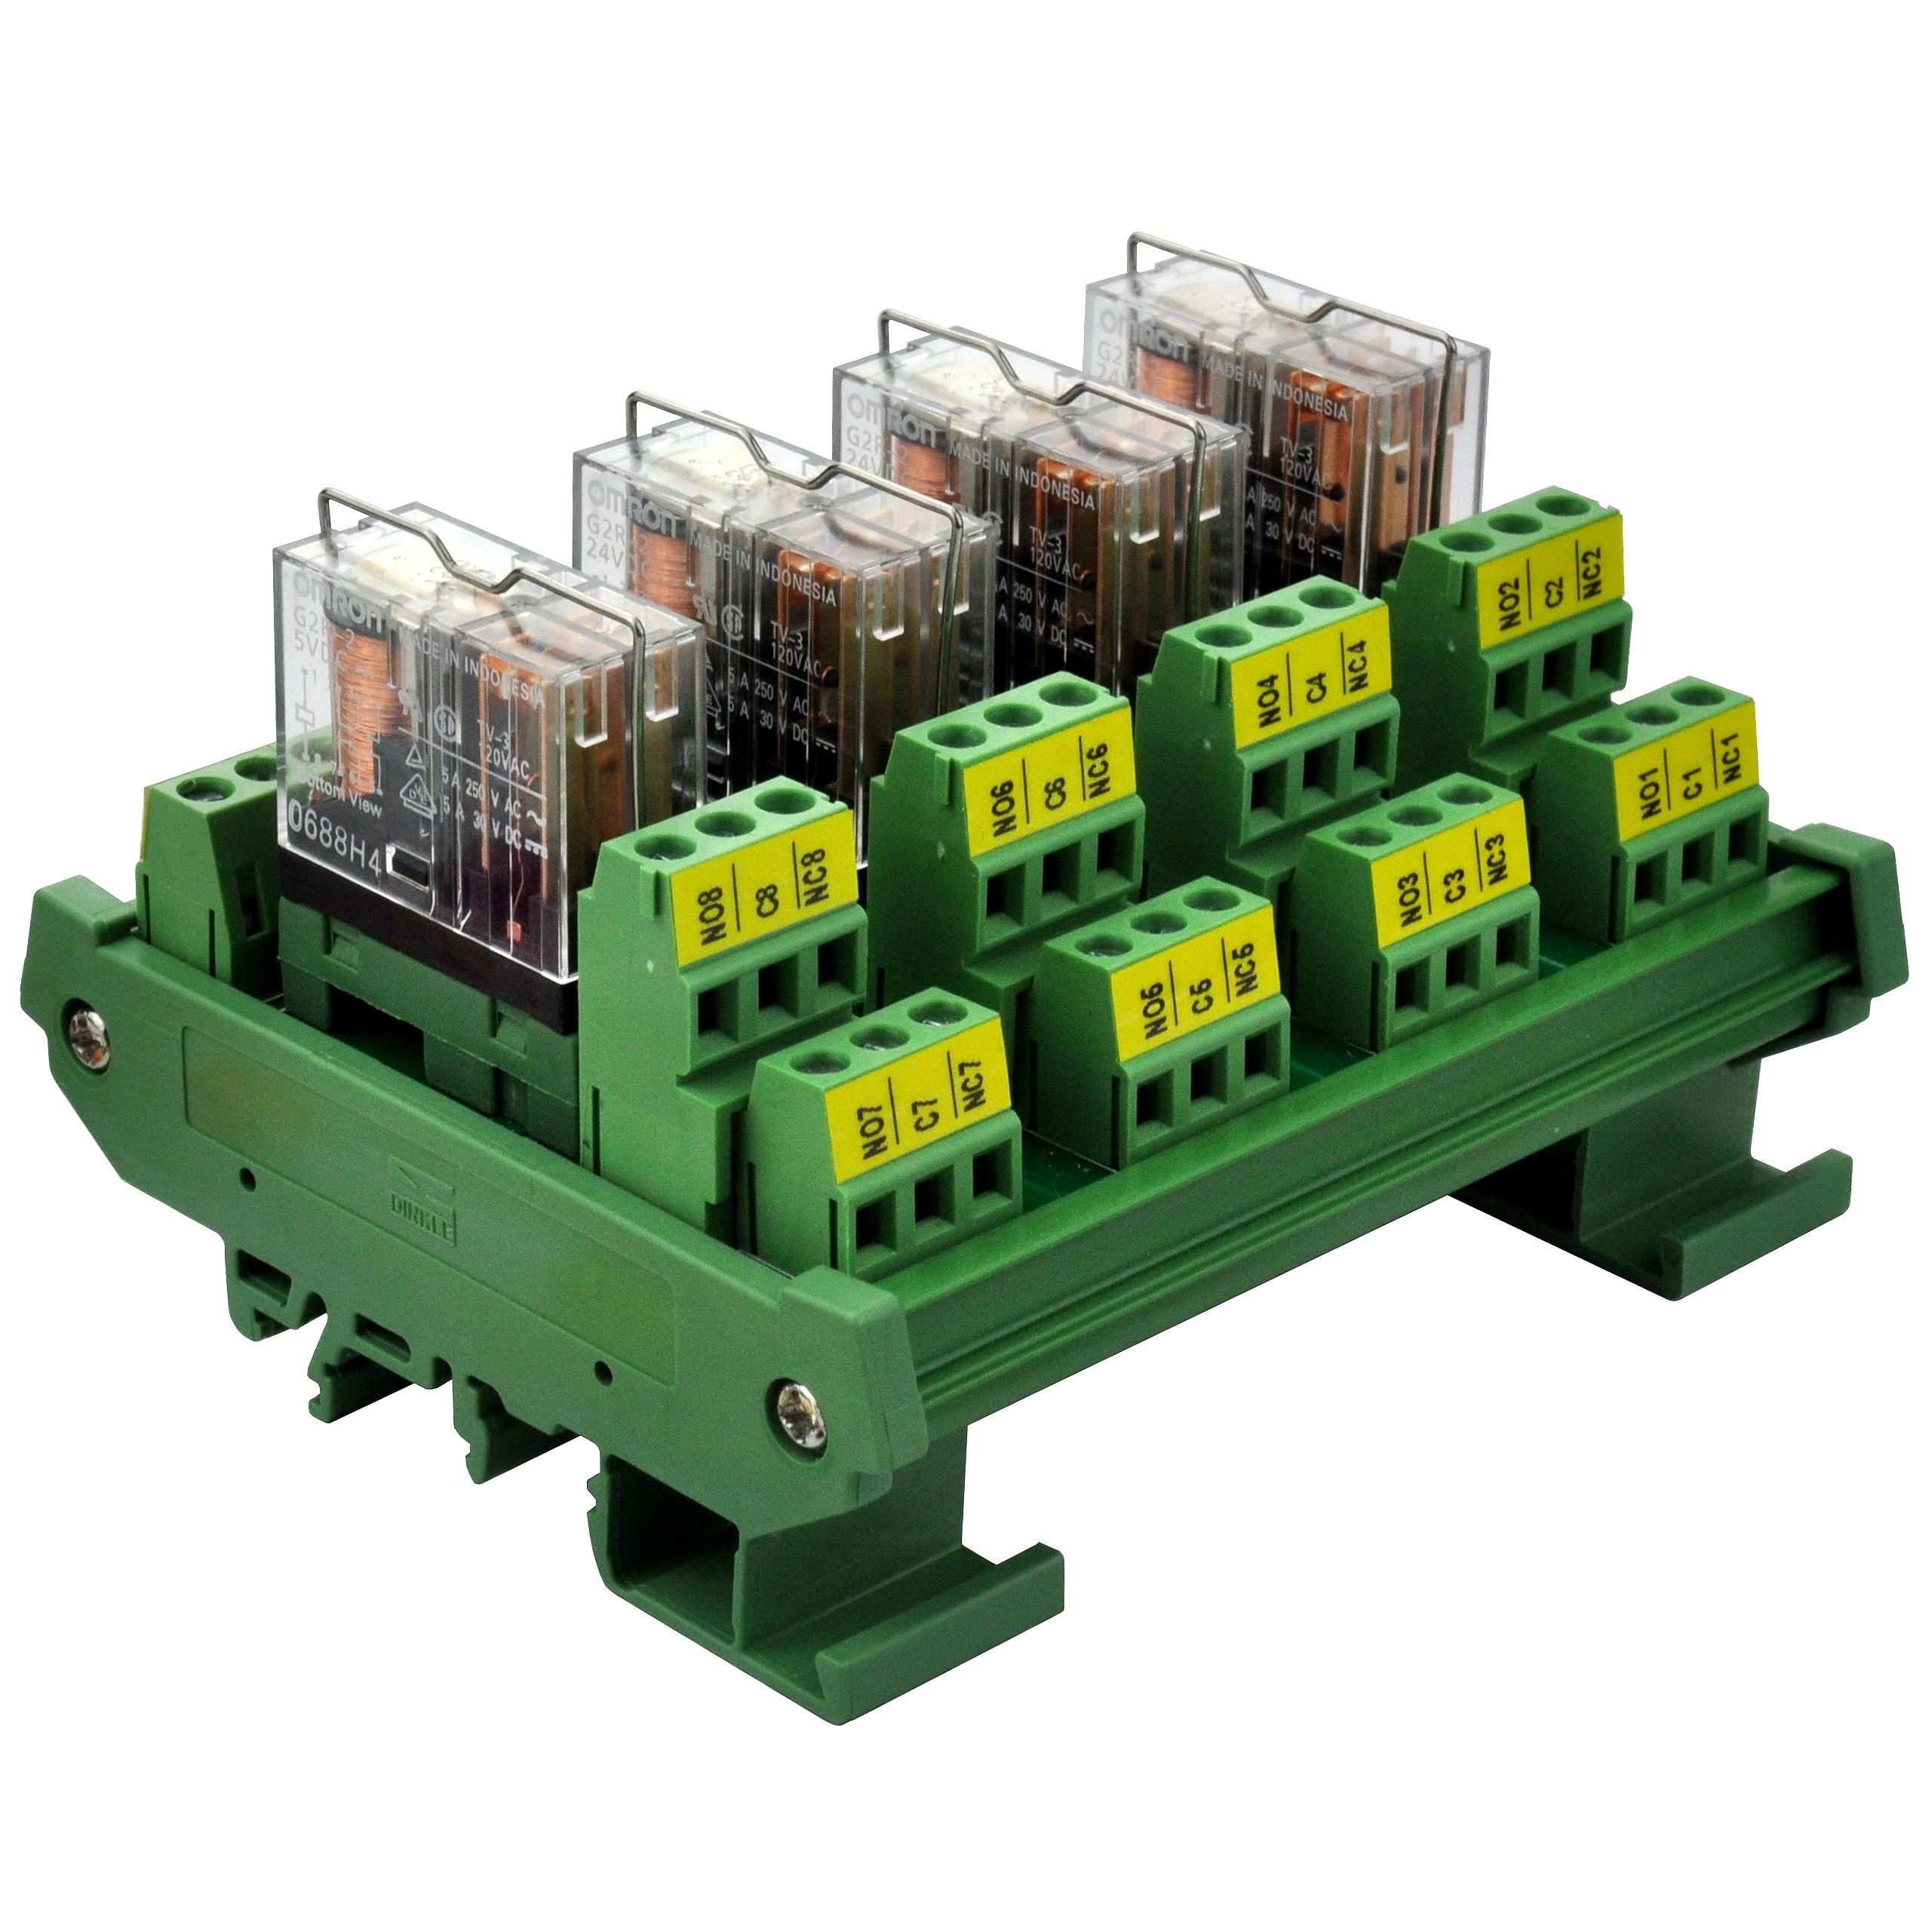 ELECTRONICS-SALON DIN Rail Mount AC/DC 5V Control 4 DPDT 5Amp Pluggable Power Relay Interface Module.